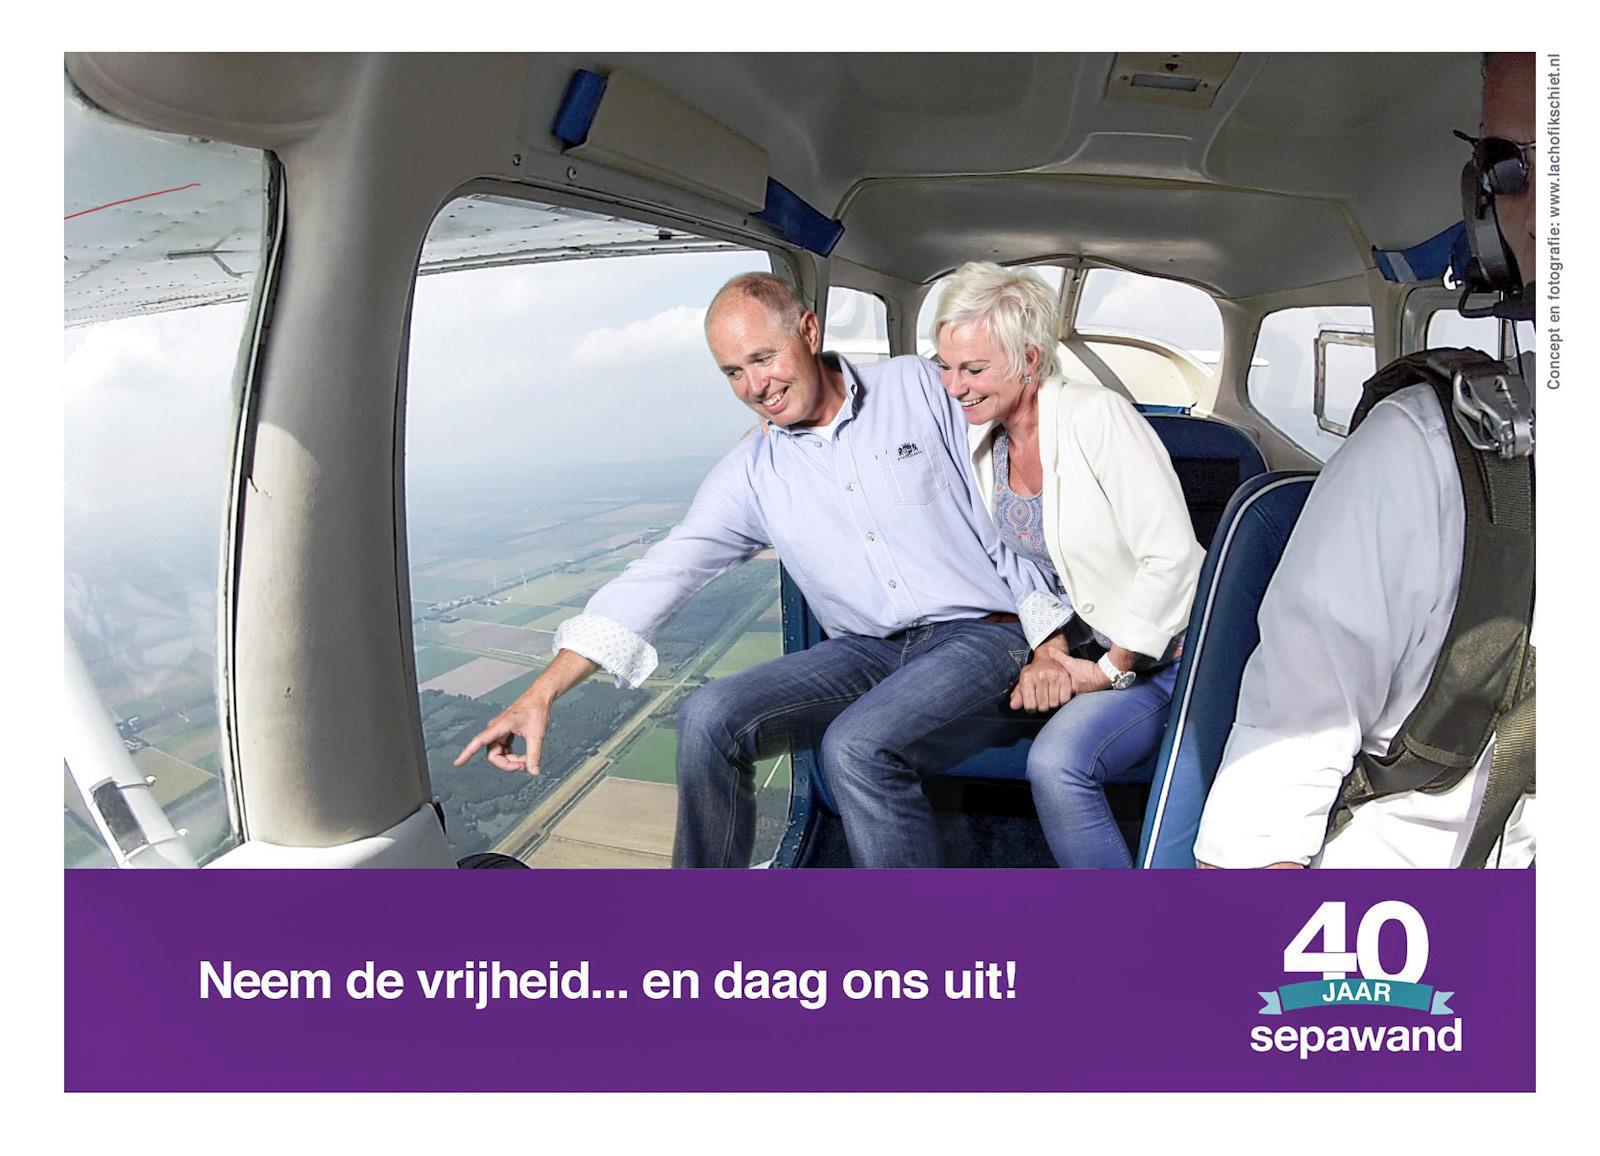 40 jaar sepawand Sepawand | Lachofikschiet.nl 40 jaar sepawand